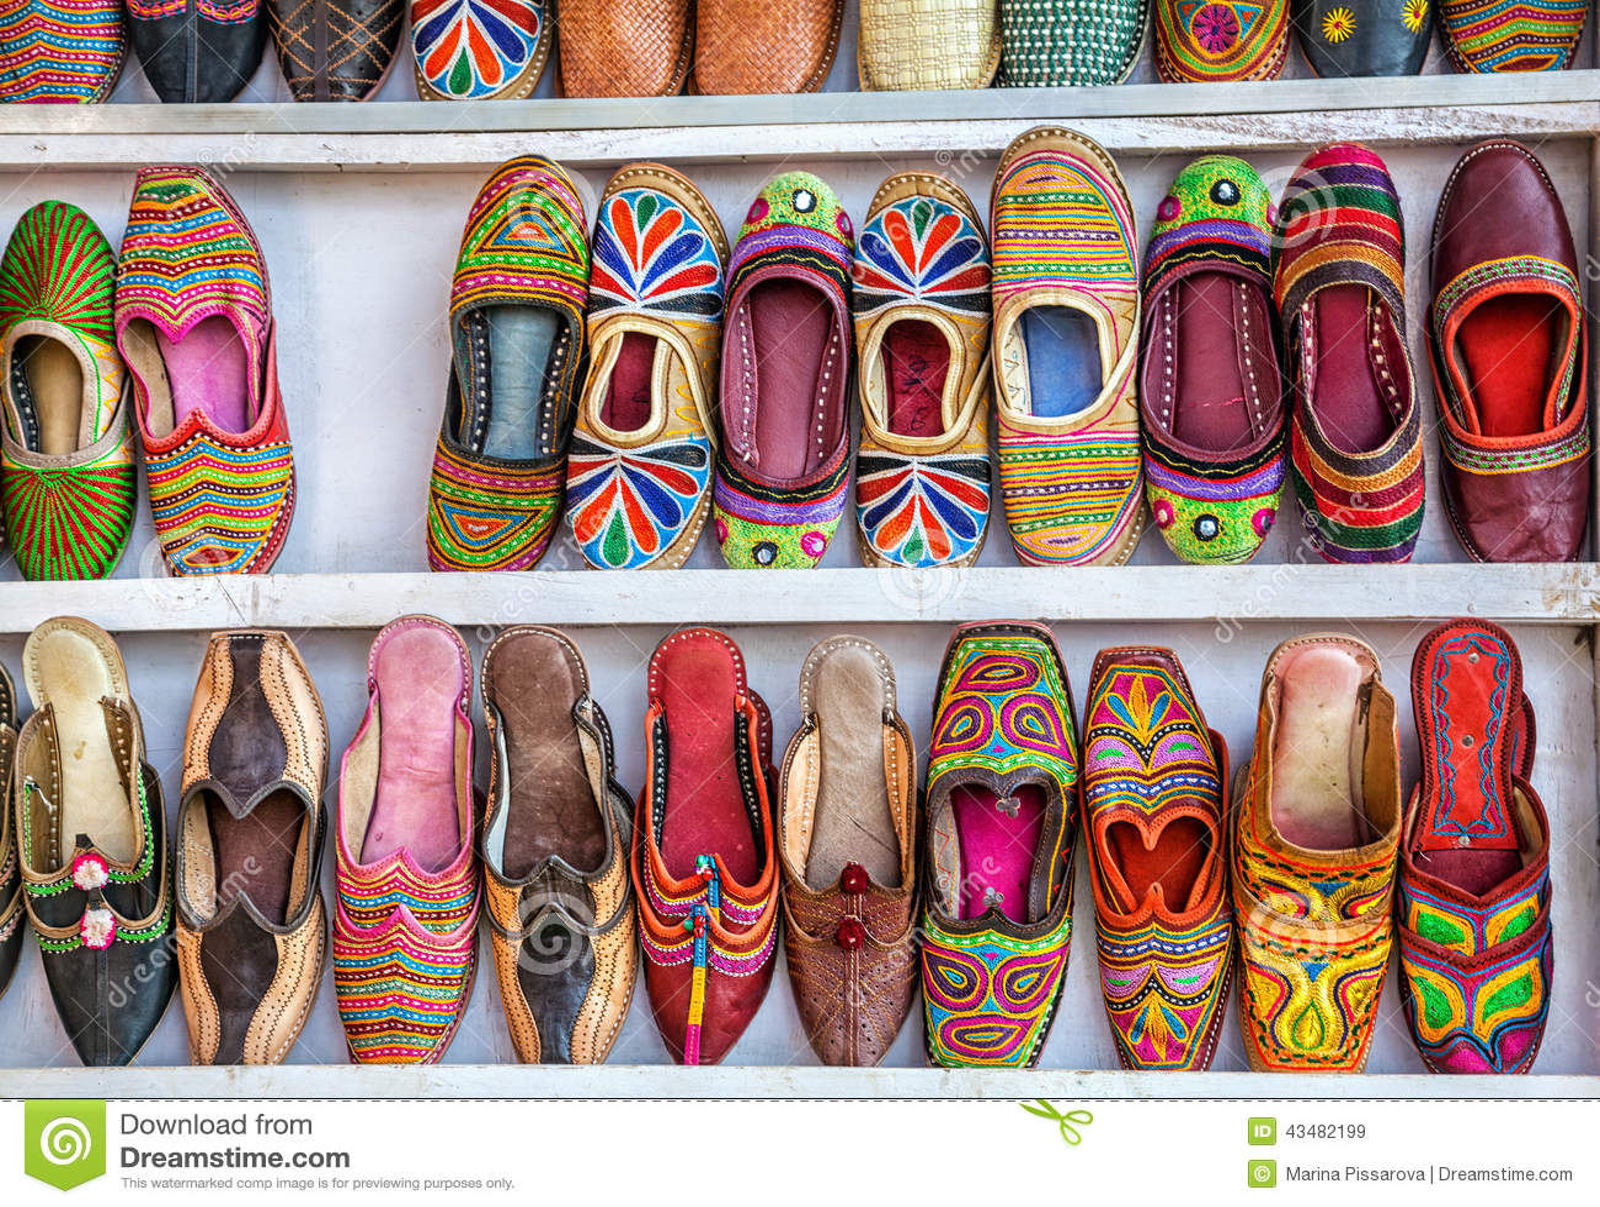 a0eb4416a2b0 εθνικά παπούτσια στοκ εικόνα. εικόνα από τέχνη, πώληση - 43482199